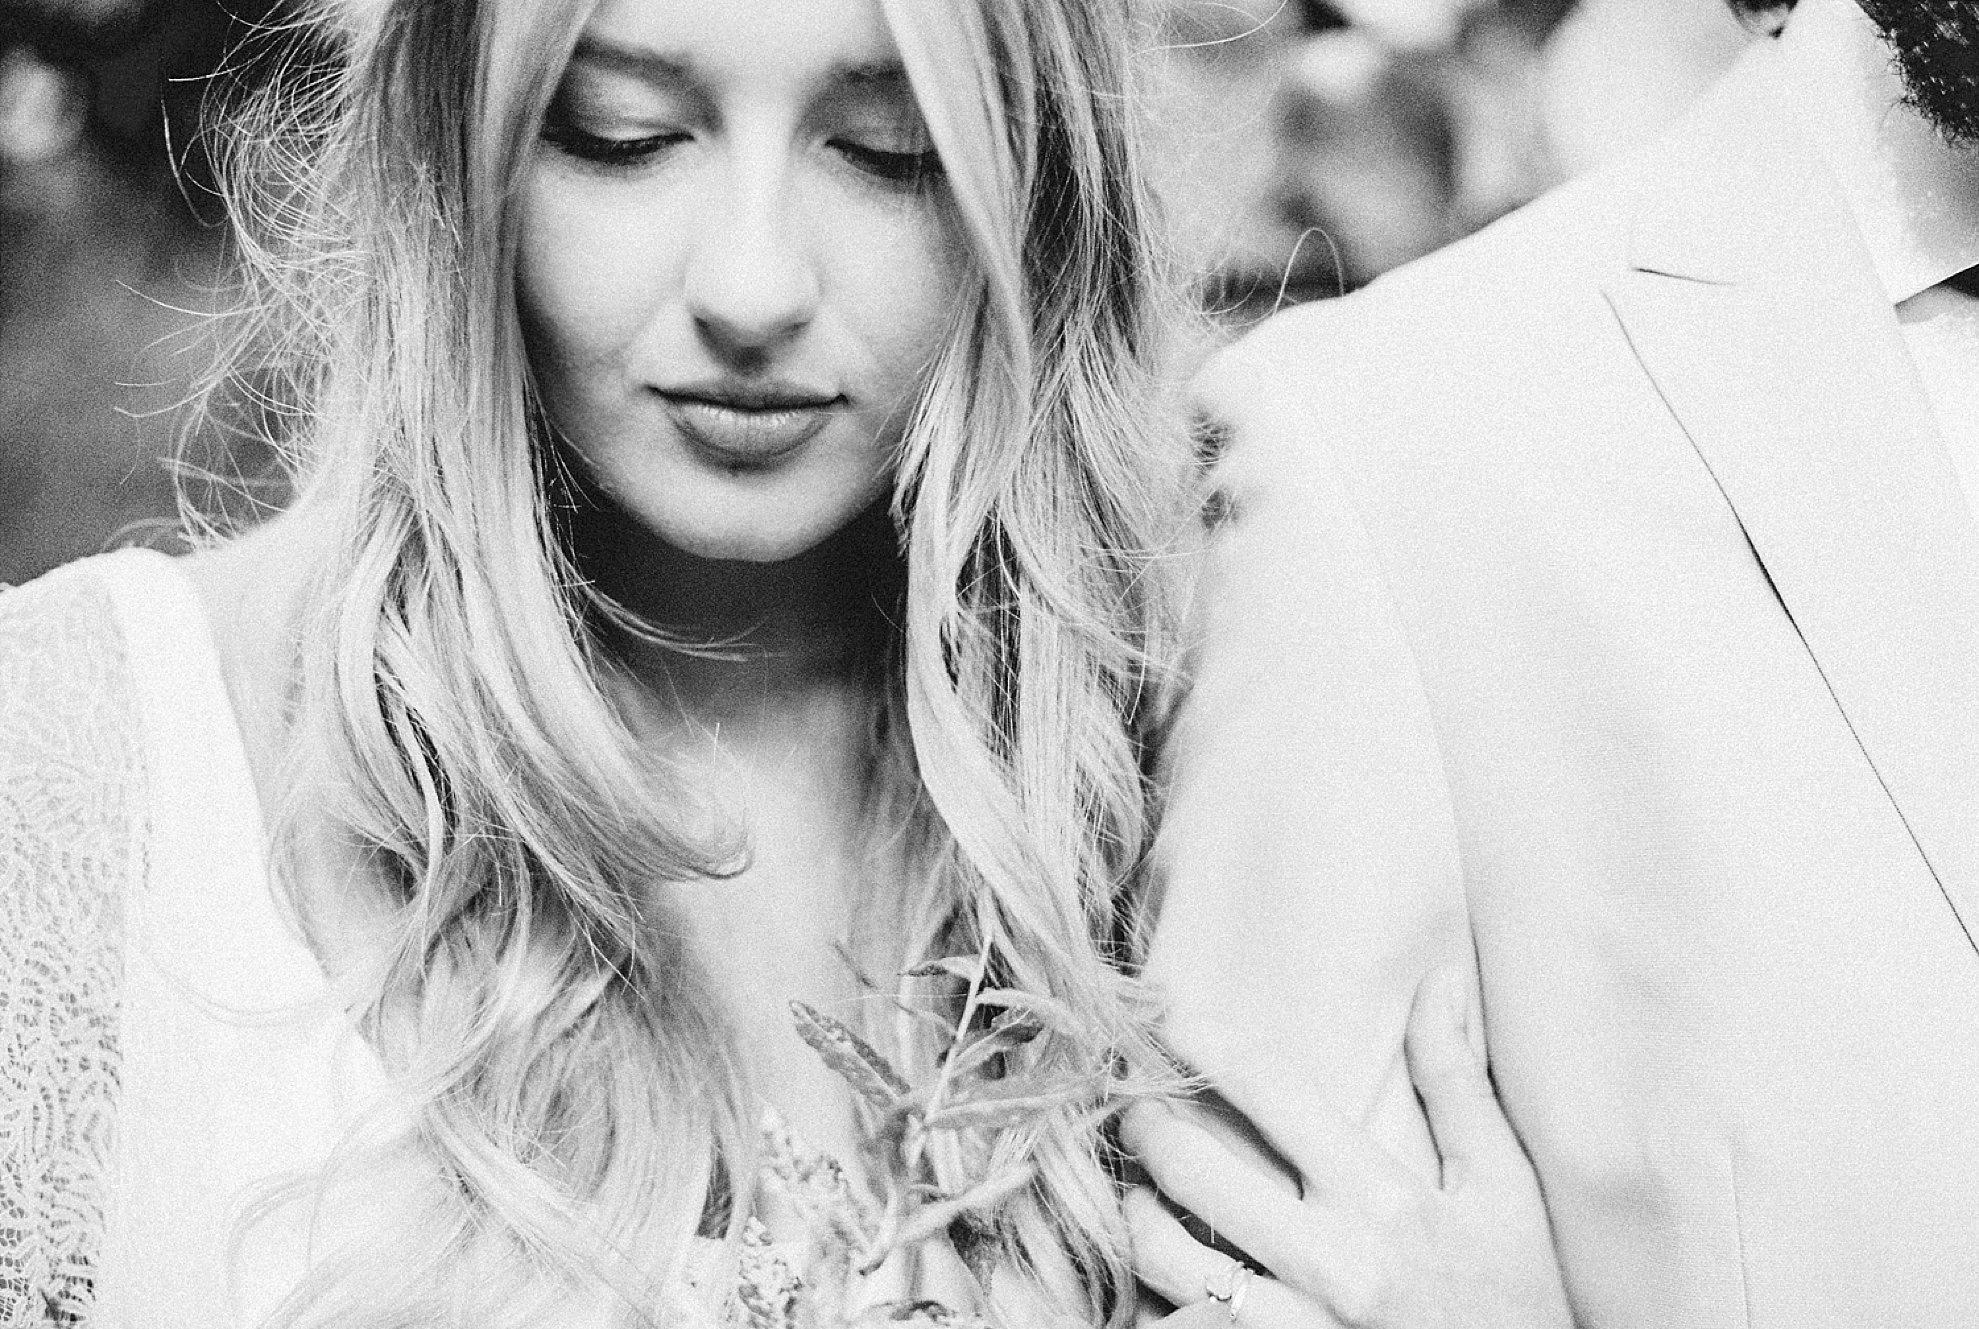 Amanda-Drost-photography-Hortus-Amsterdam-wedding_0001.jpg